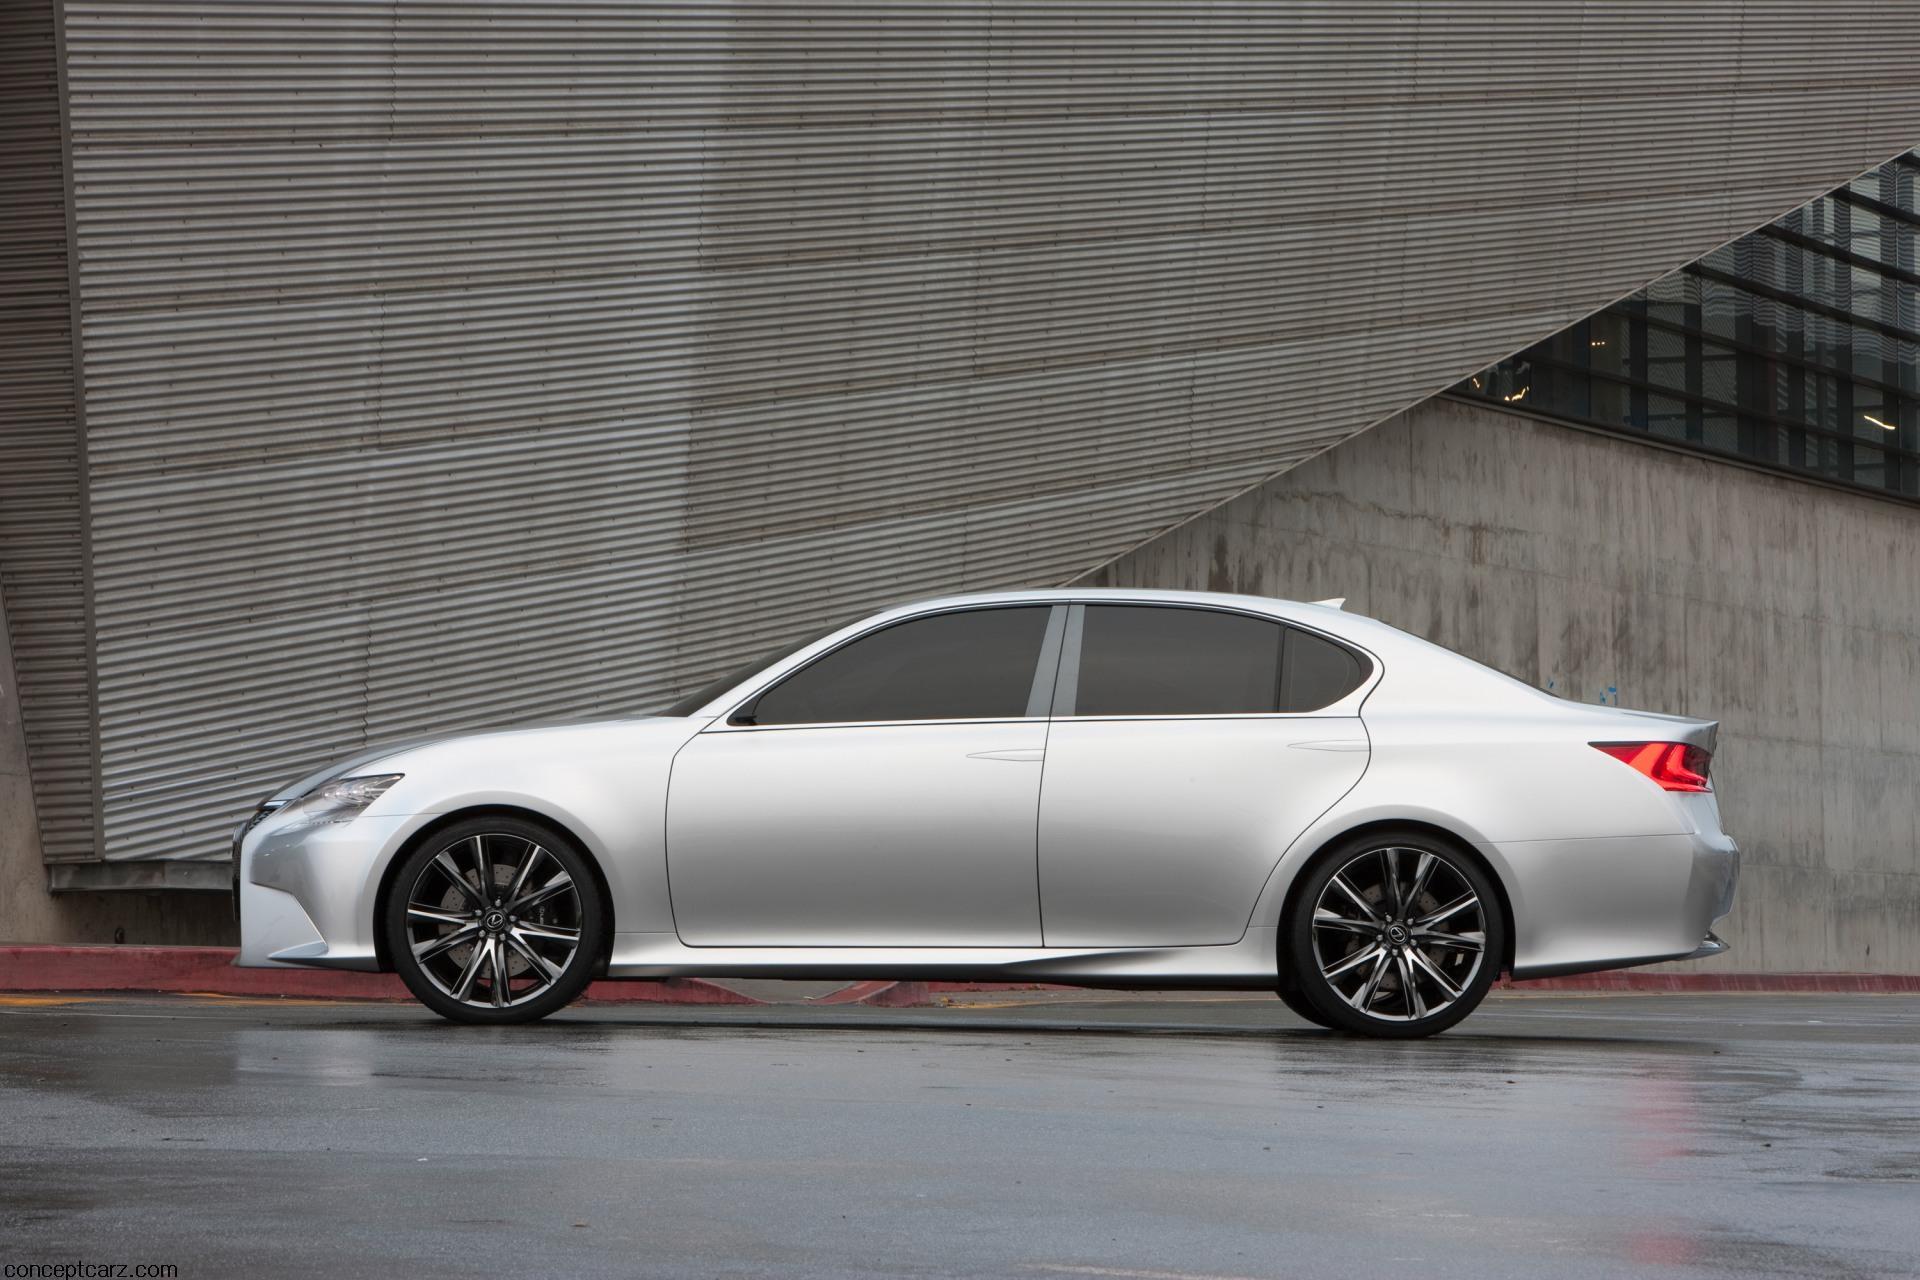 Gs Auto Sales >> 2011 Lexus LF-Gh Hybrid Concept News and Information